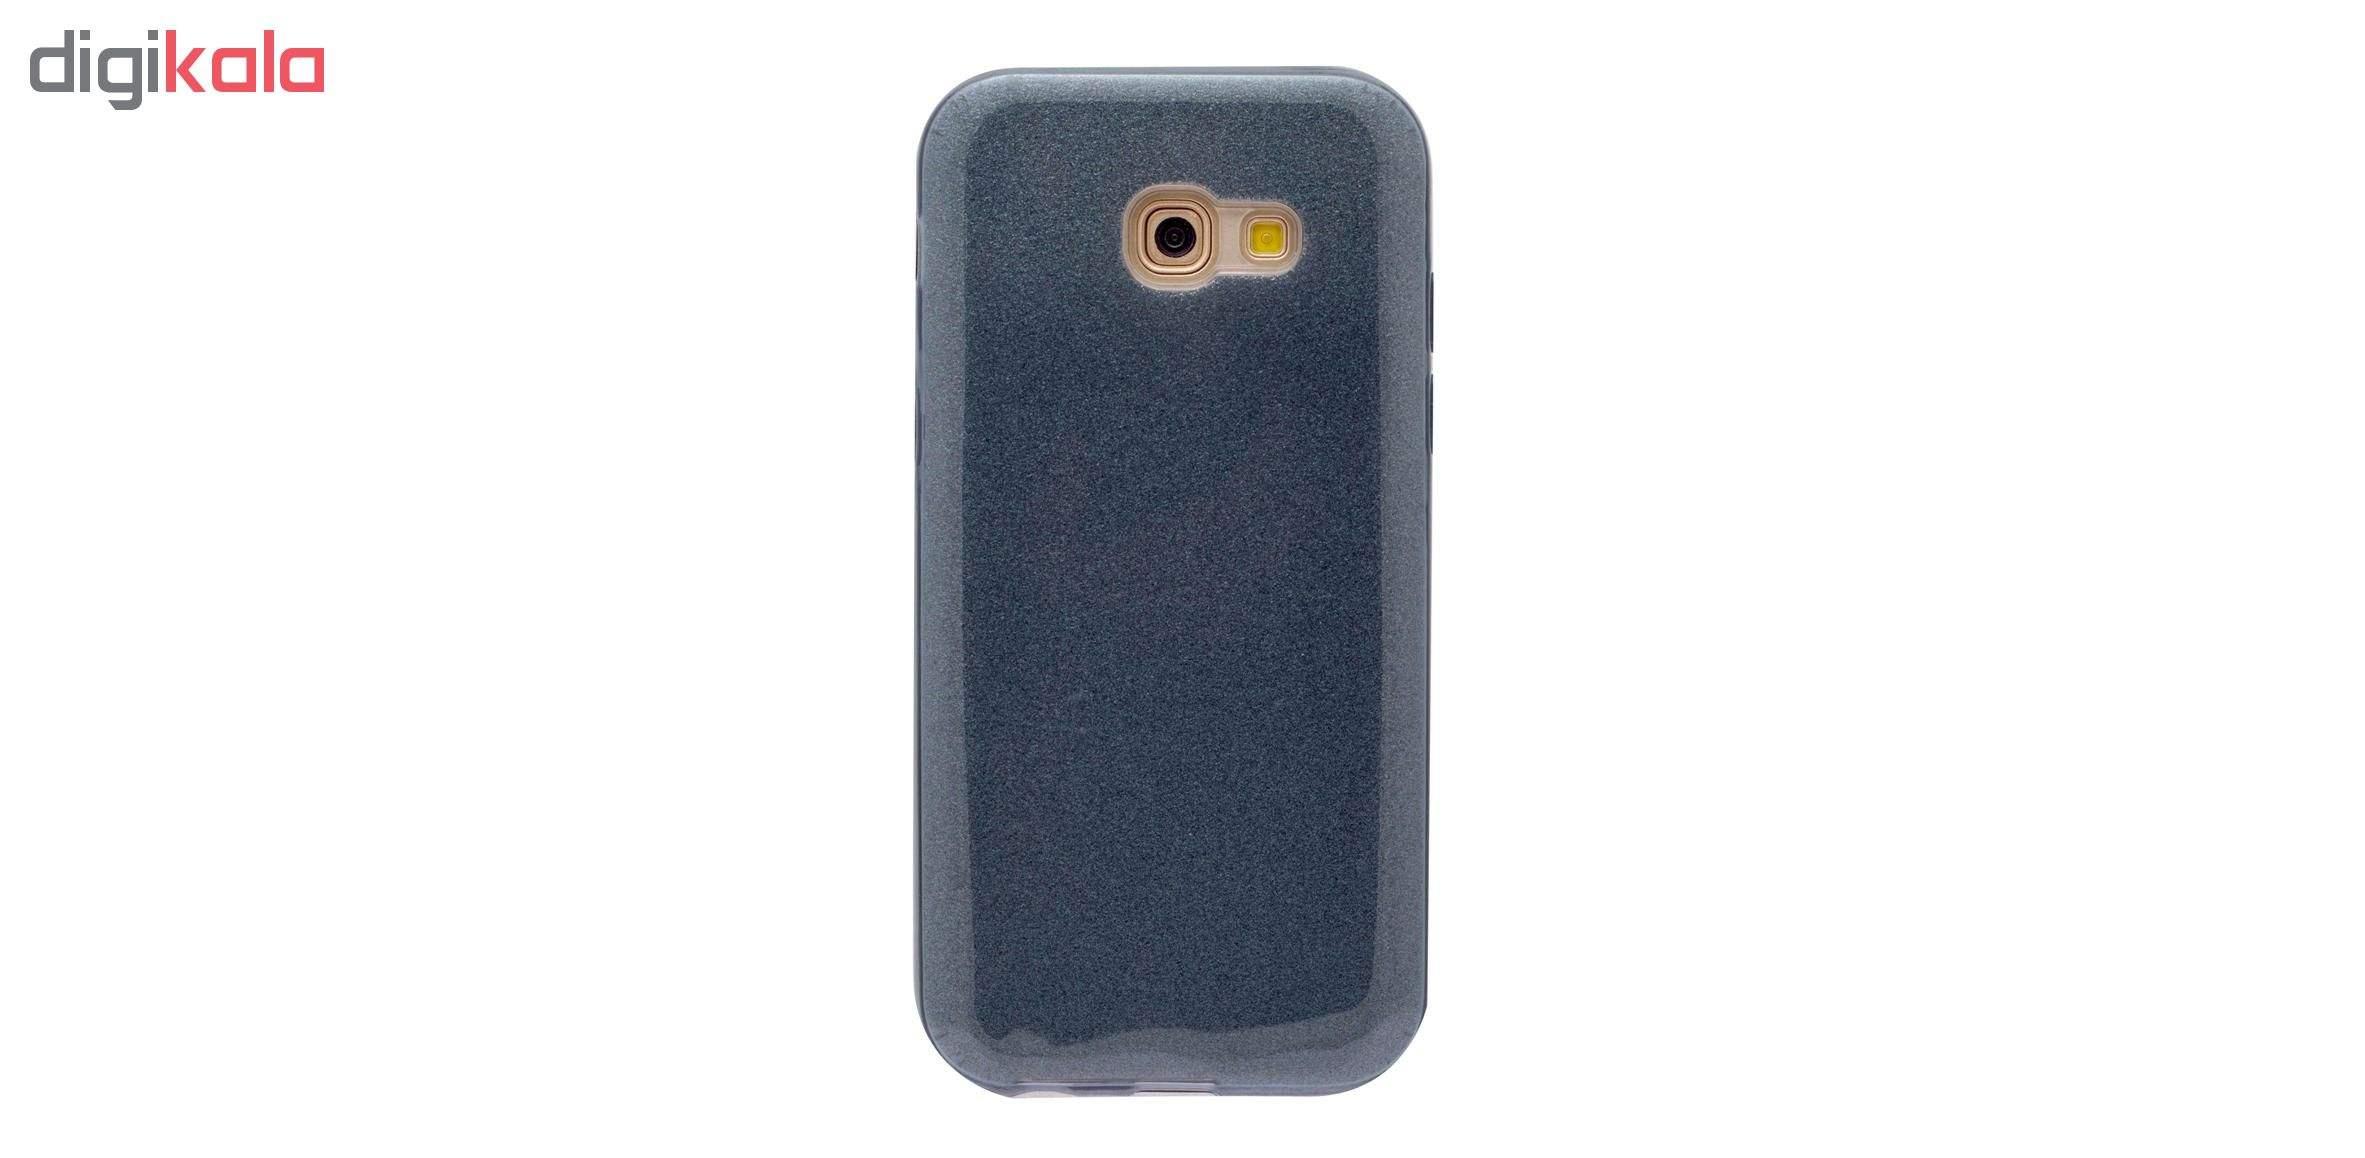 کاور مدل CORONA طرح اکلیلی مناسب برای گوشی سامسونگ گلکسی A5 2017 / A520 main 1 21